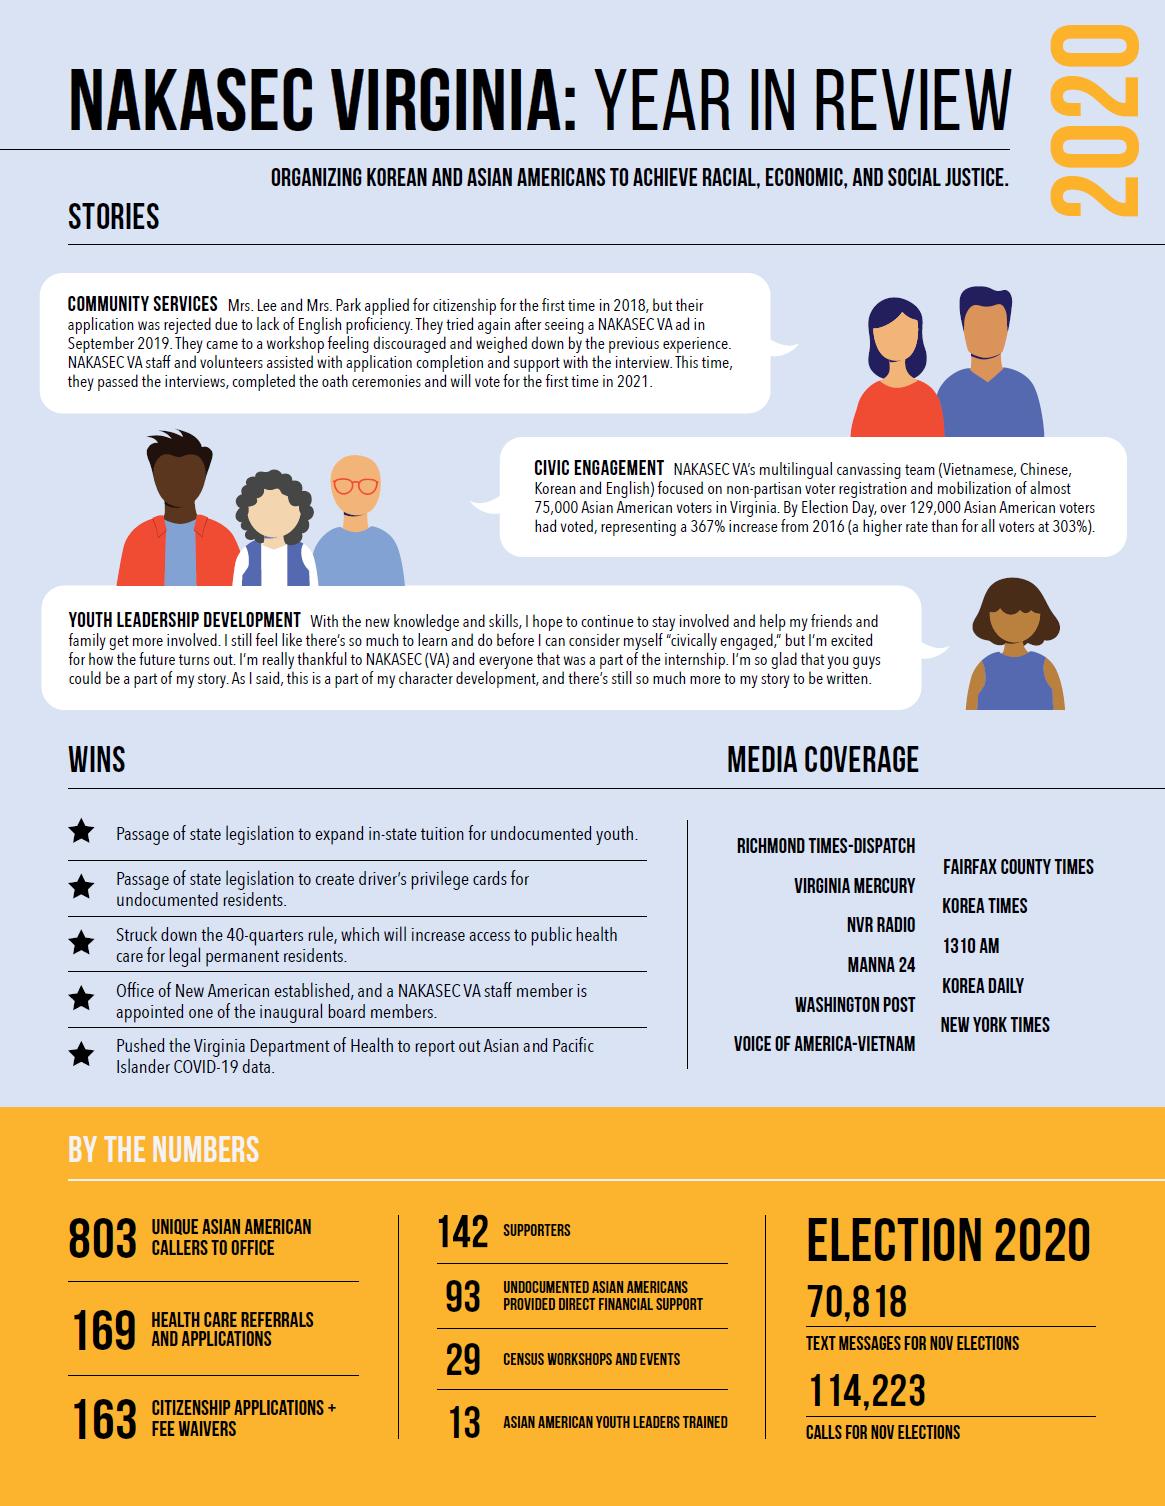 NAKASEC Virginia: 2020 Year in Review